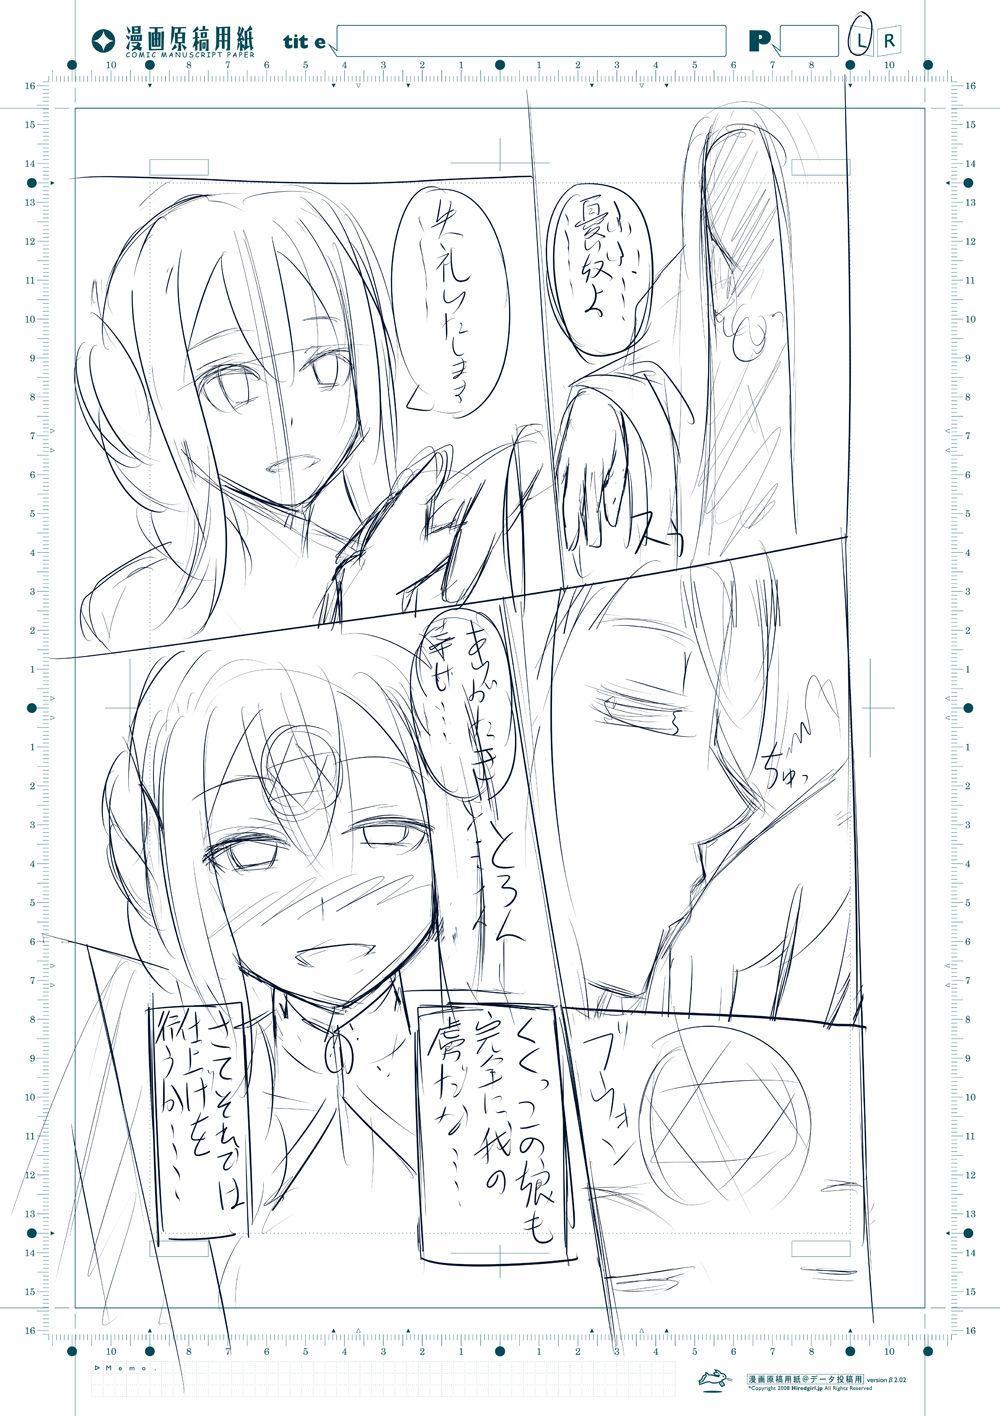 Goblin Slayer Sennou Manga 21